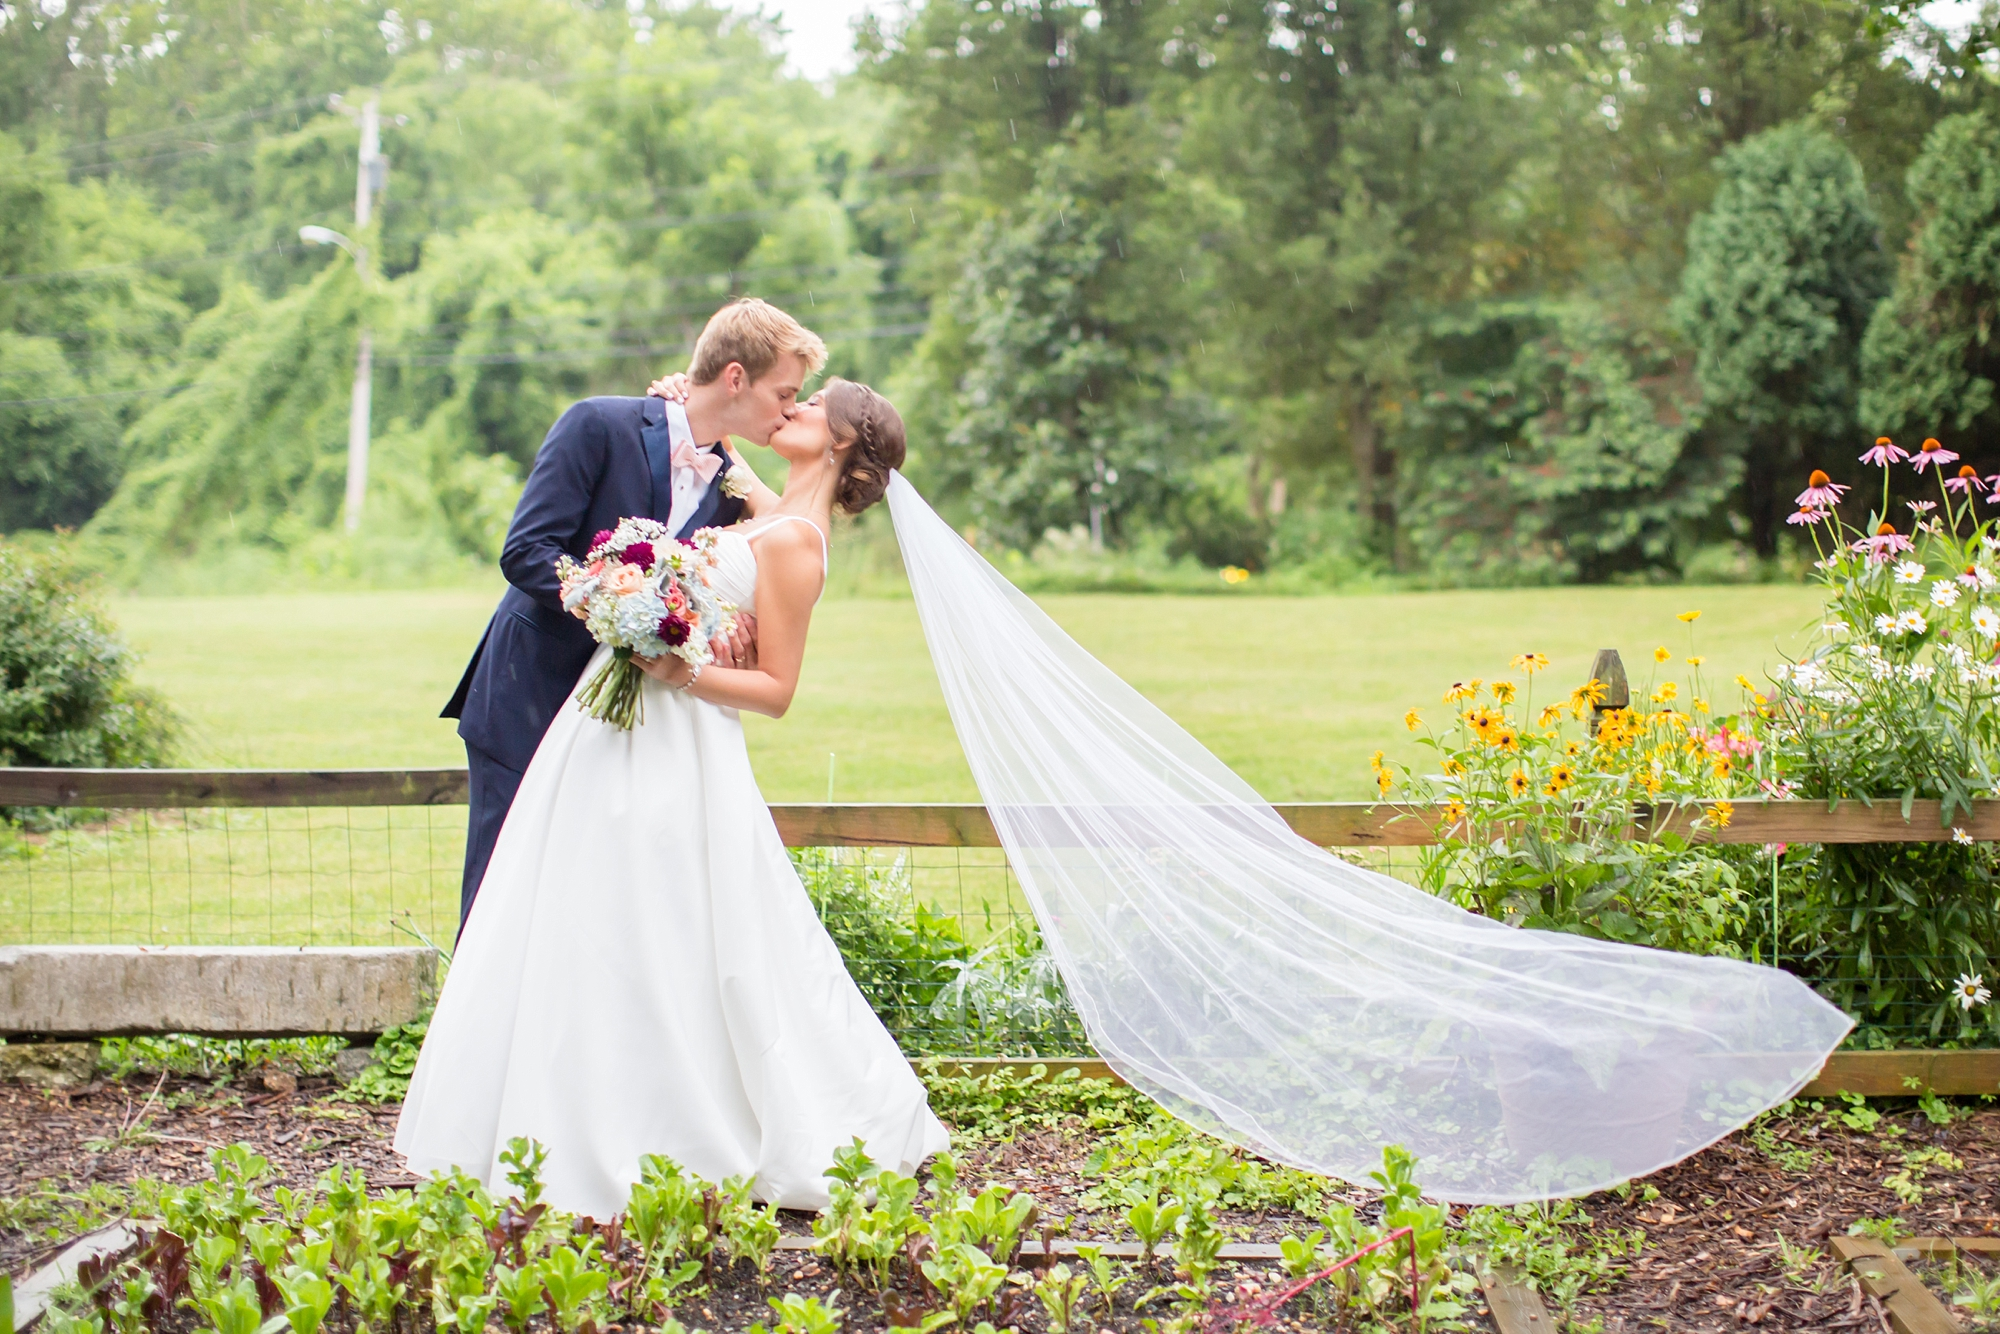 Russell 5-Bride & Groom Portraits-828_anna grace photography baltimore maryland wedding photographer elkridge furnace inn wedding photo.jpg